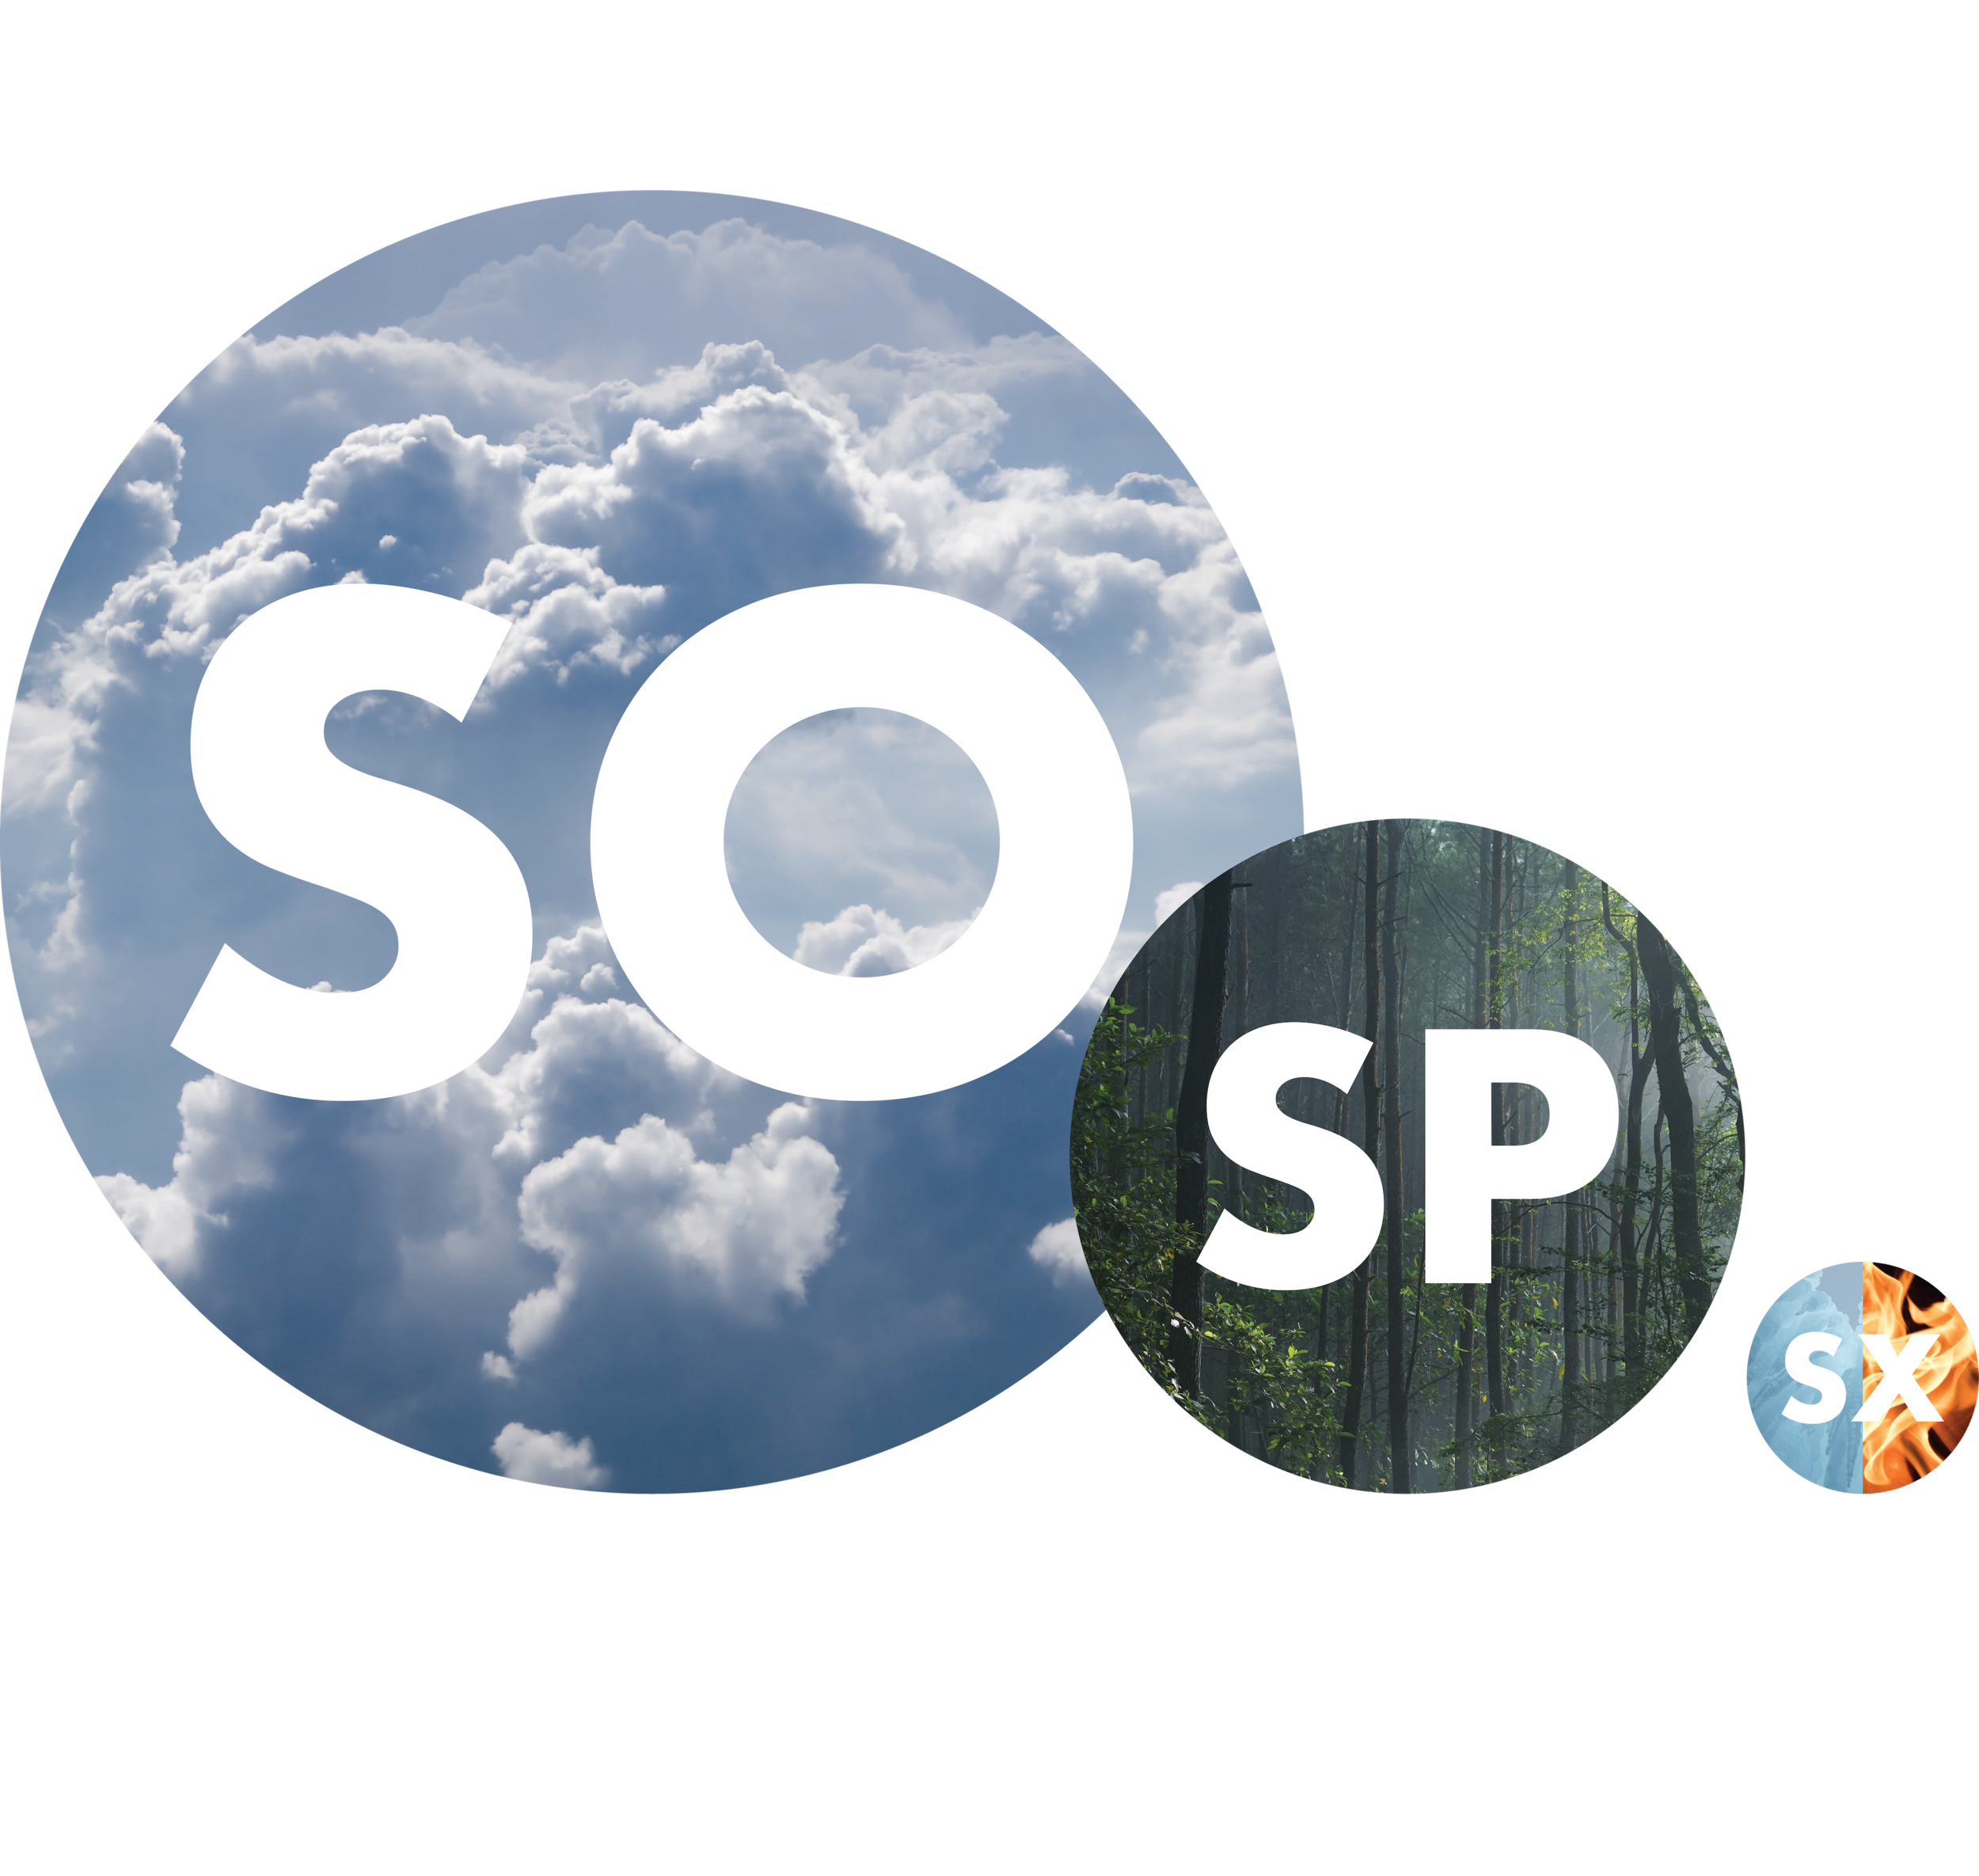 SOSPSX.png